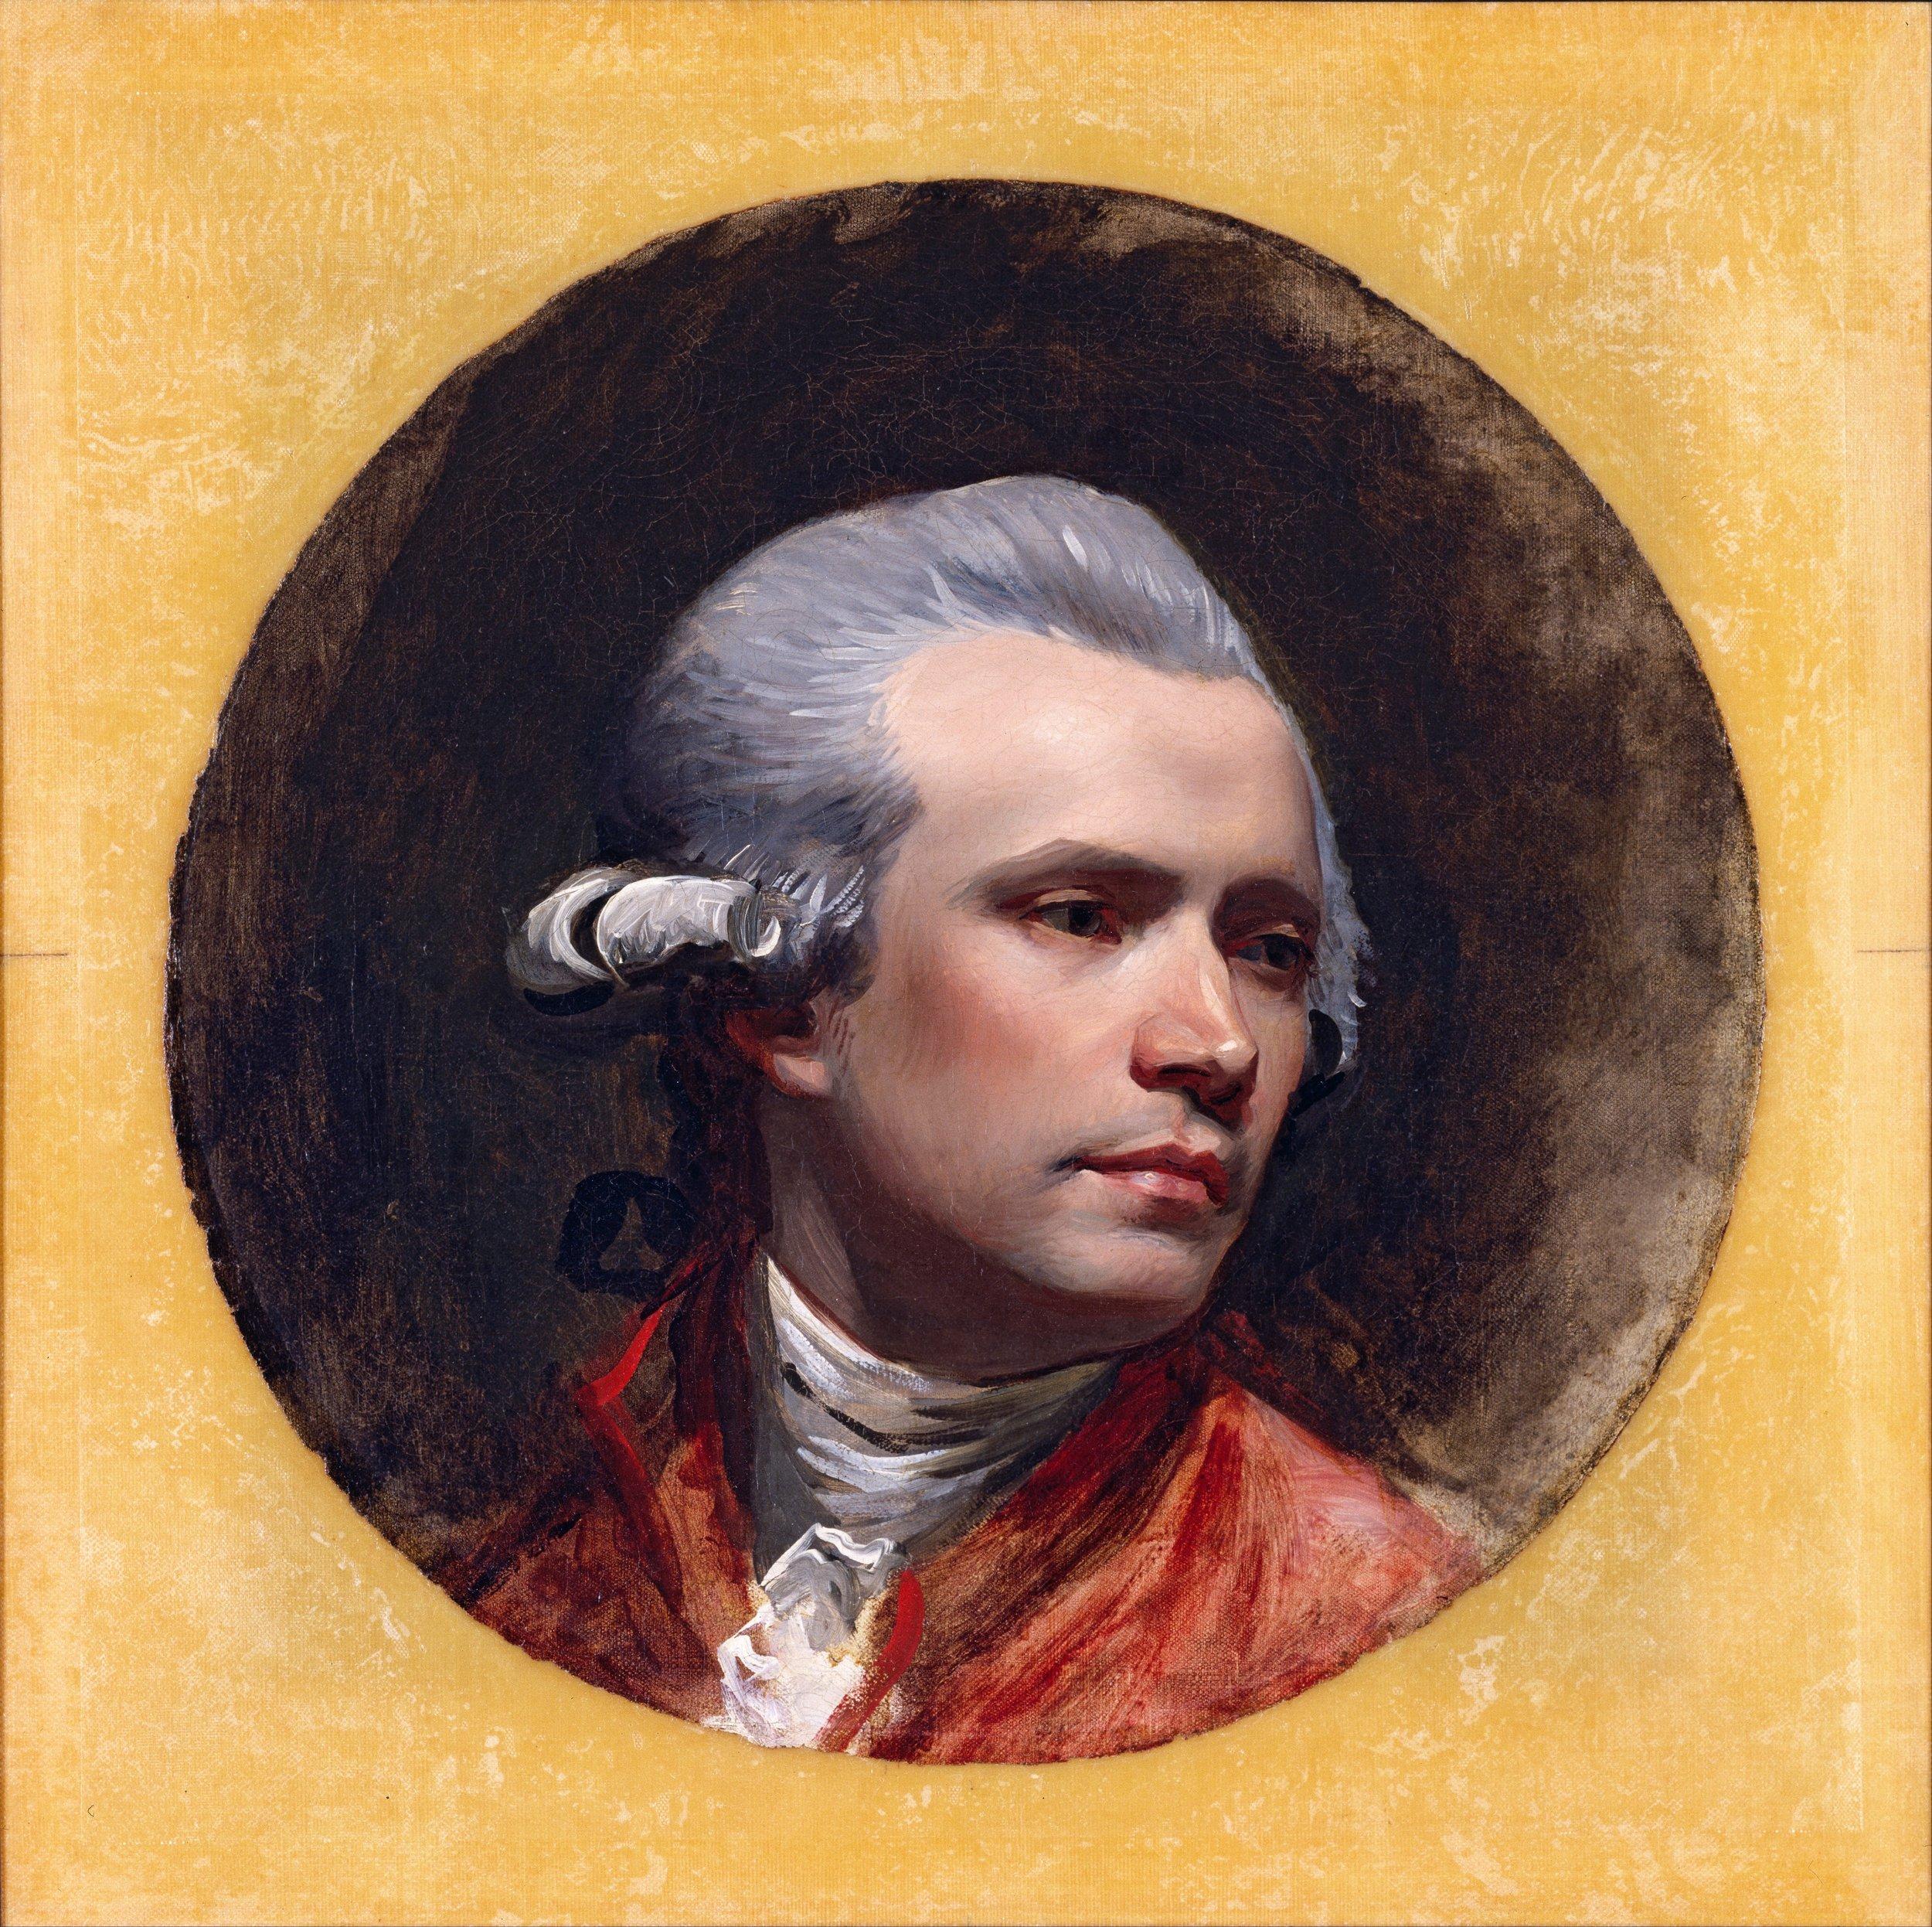 John_Singleton_Copley_-_John_Singleton_Copley_Self-Portrait_-_Google_Art_Project (1).jpg